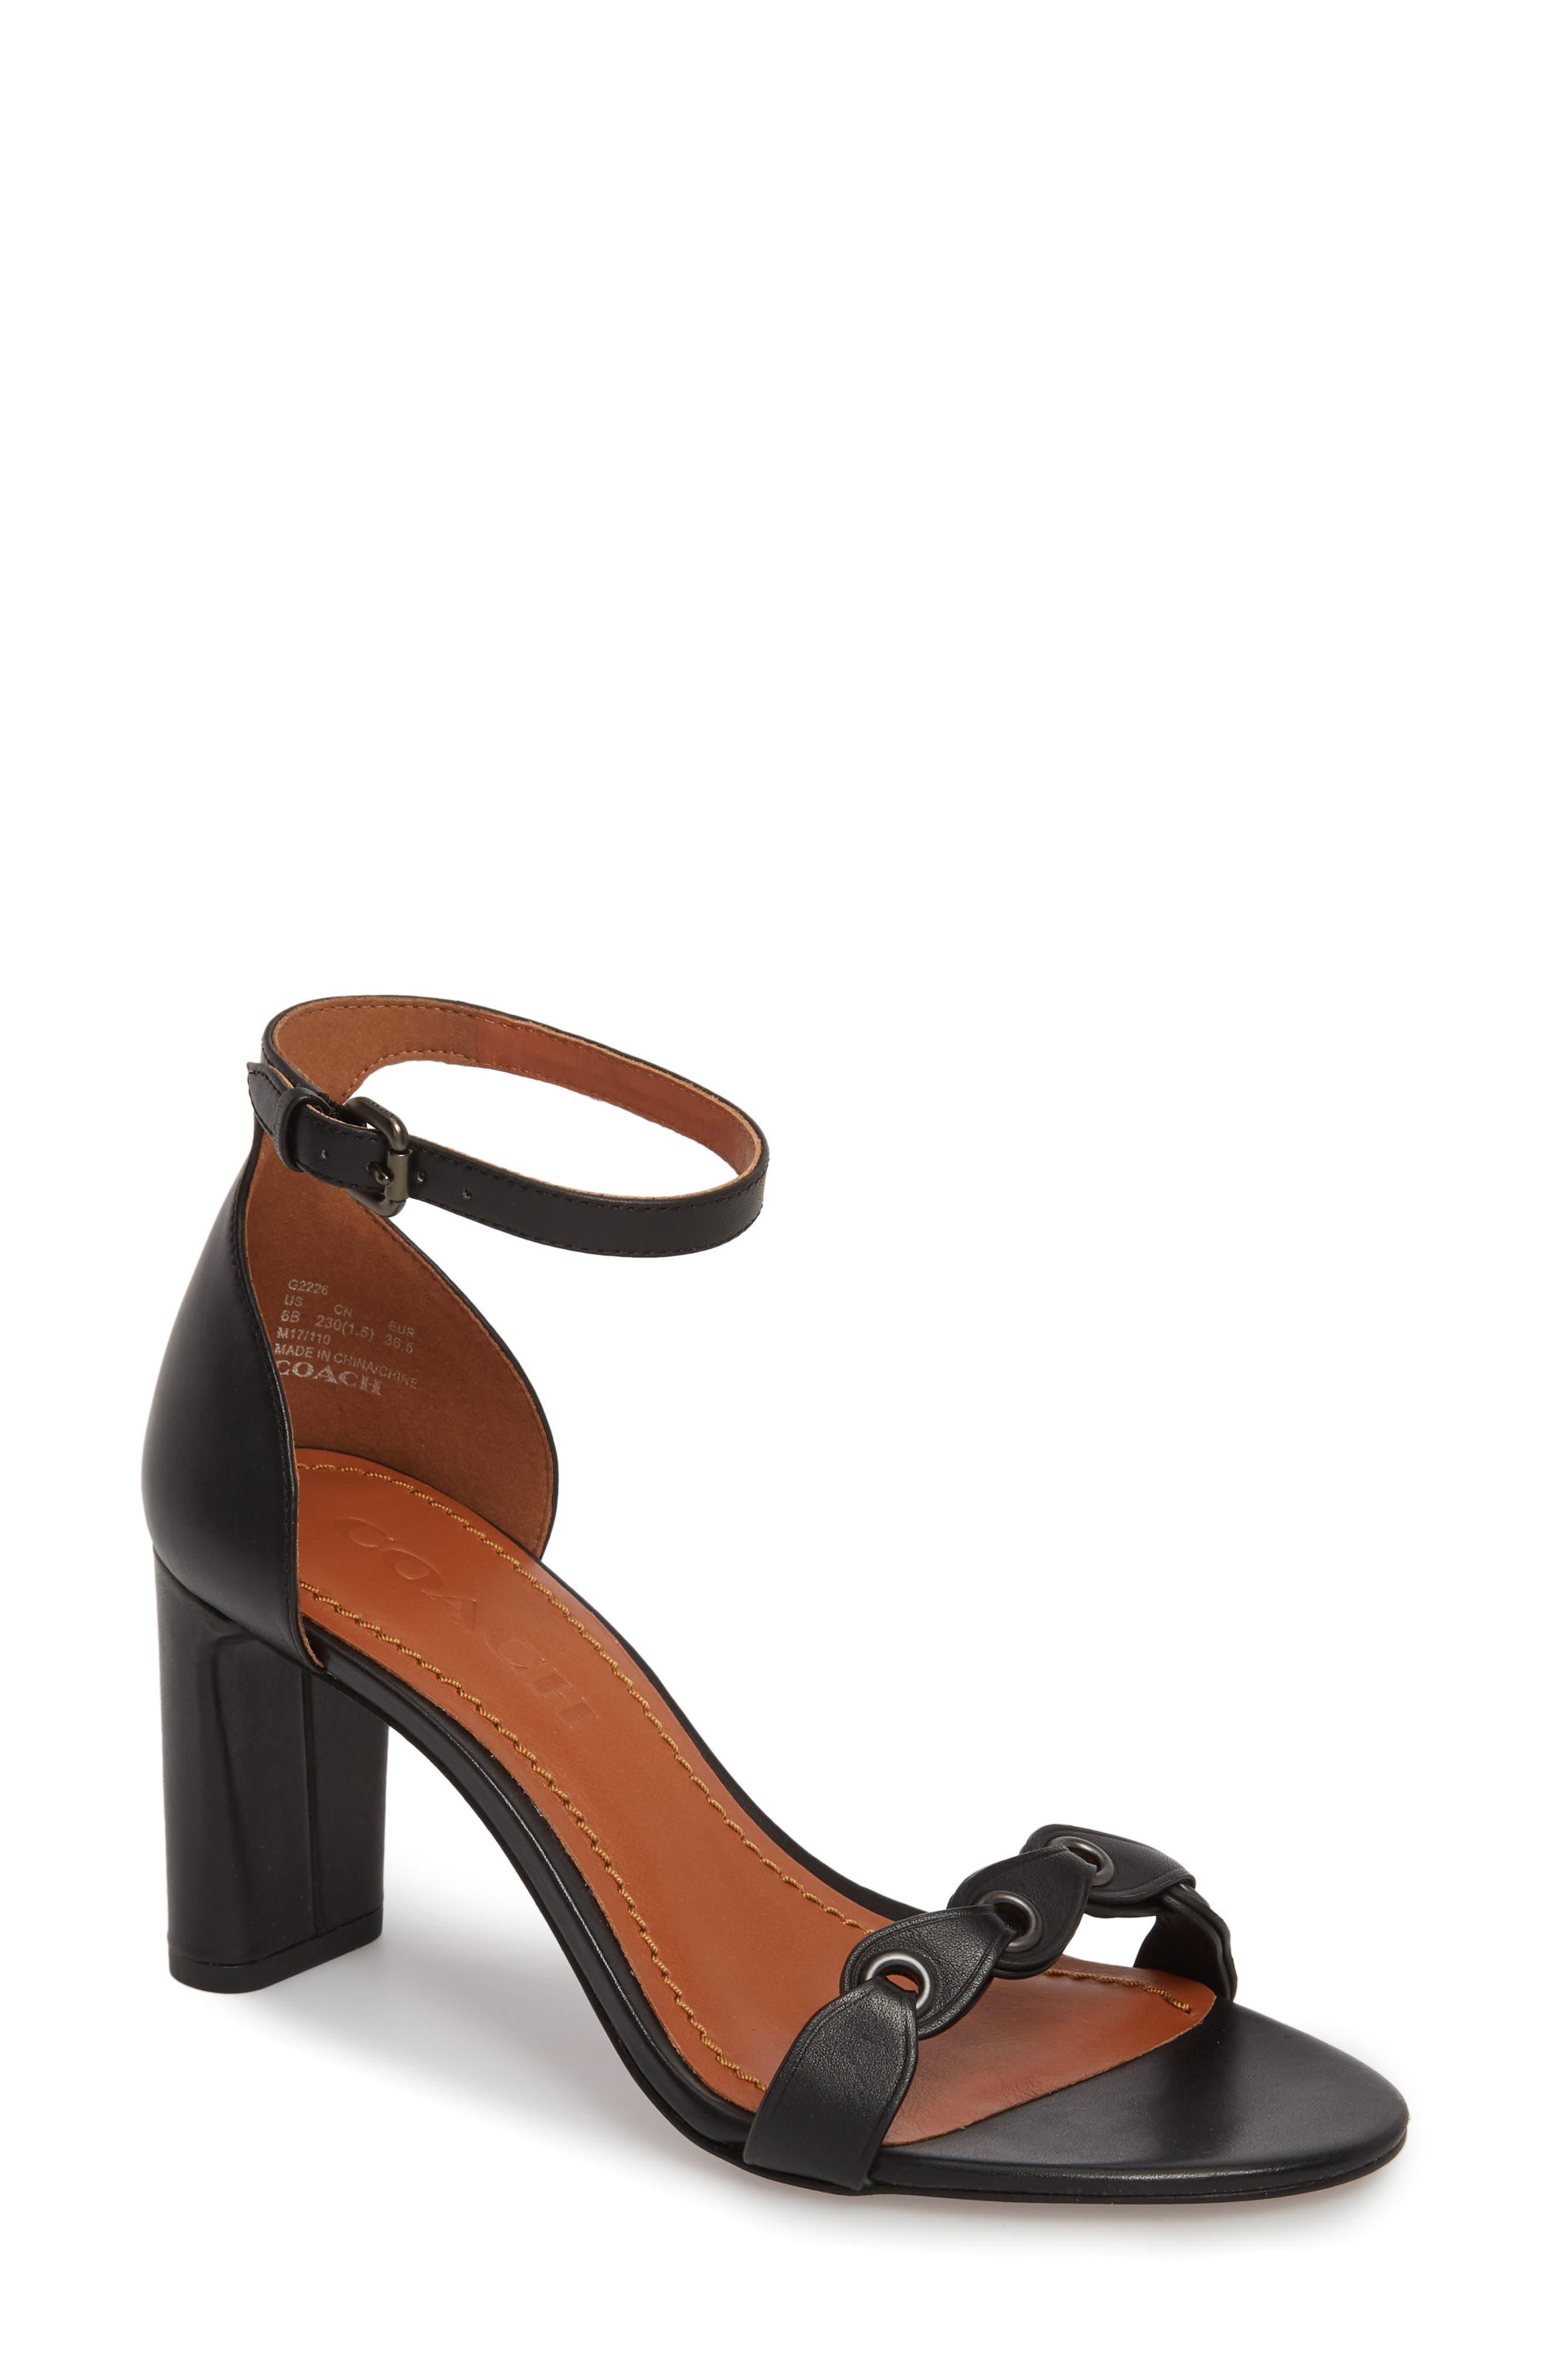 Link Ankle Strap Sandal,                             Main thumbnail 1, color,                             Black Leather